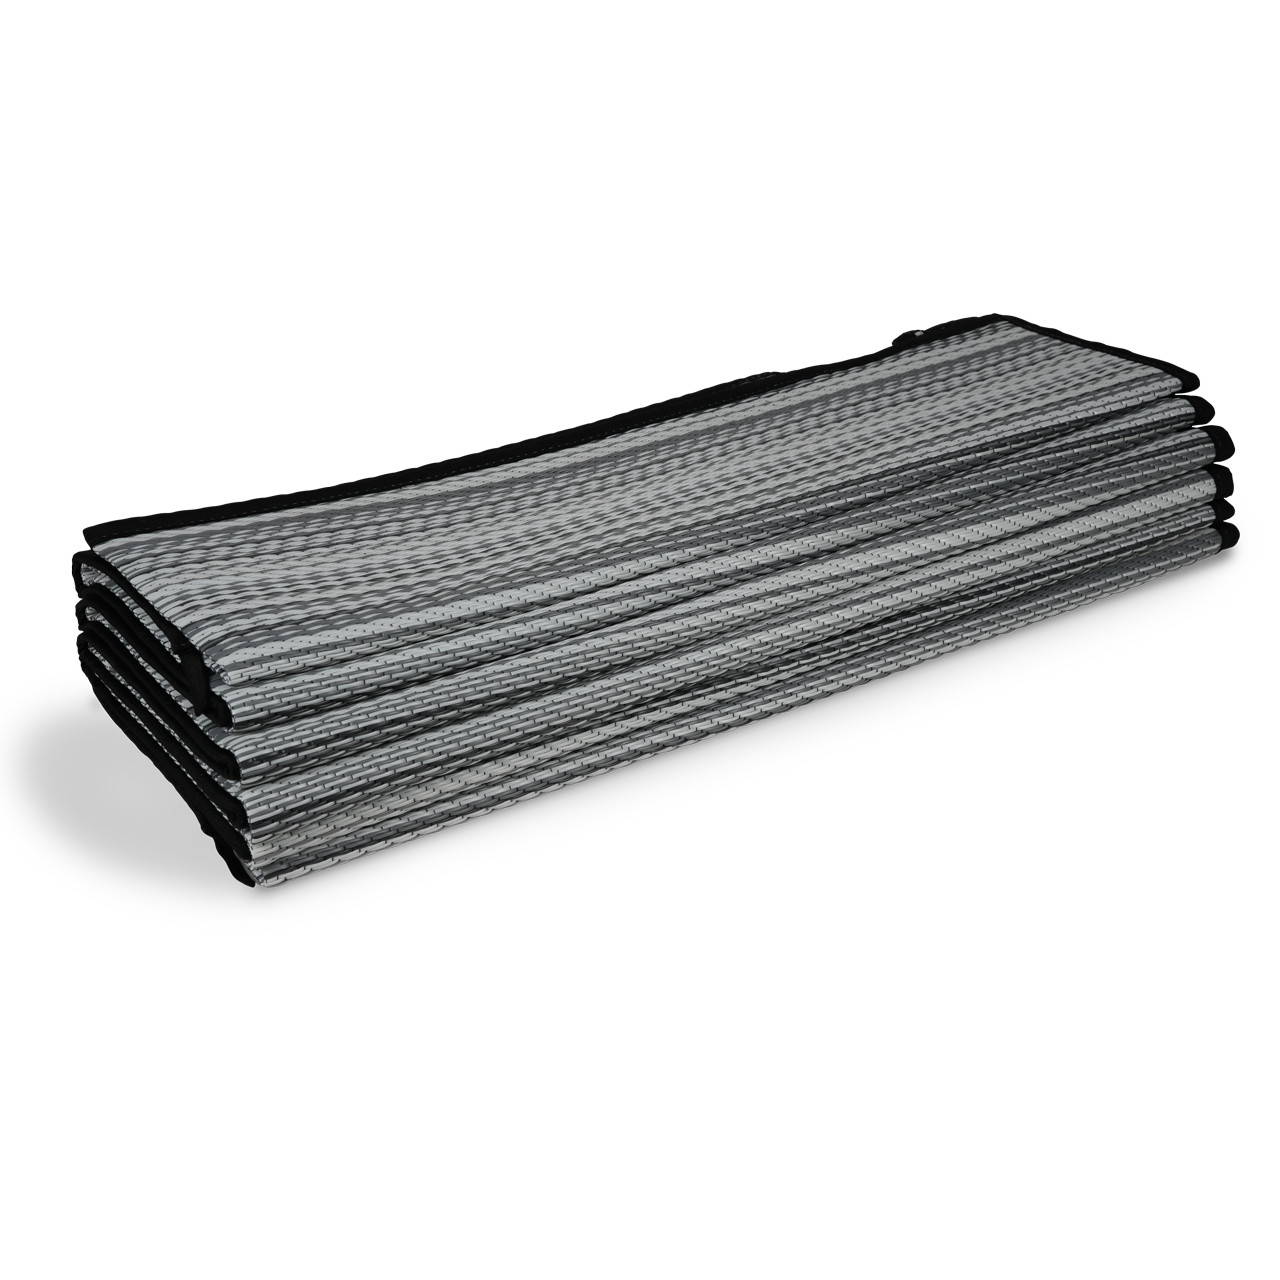 Kampa Dometic Continental Carpet 250 x 400cm